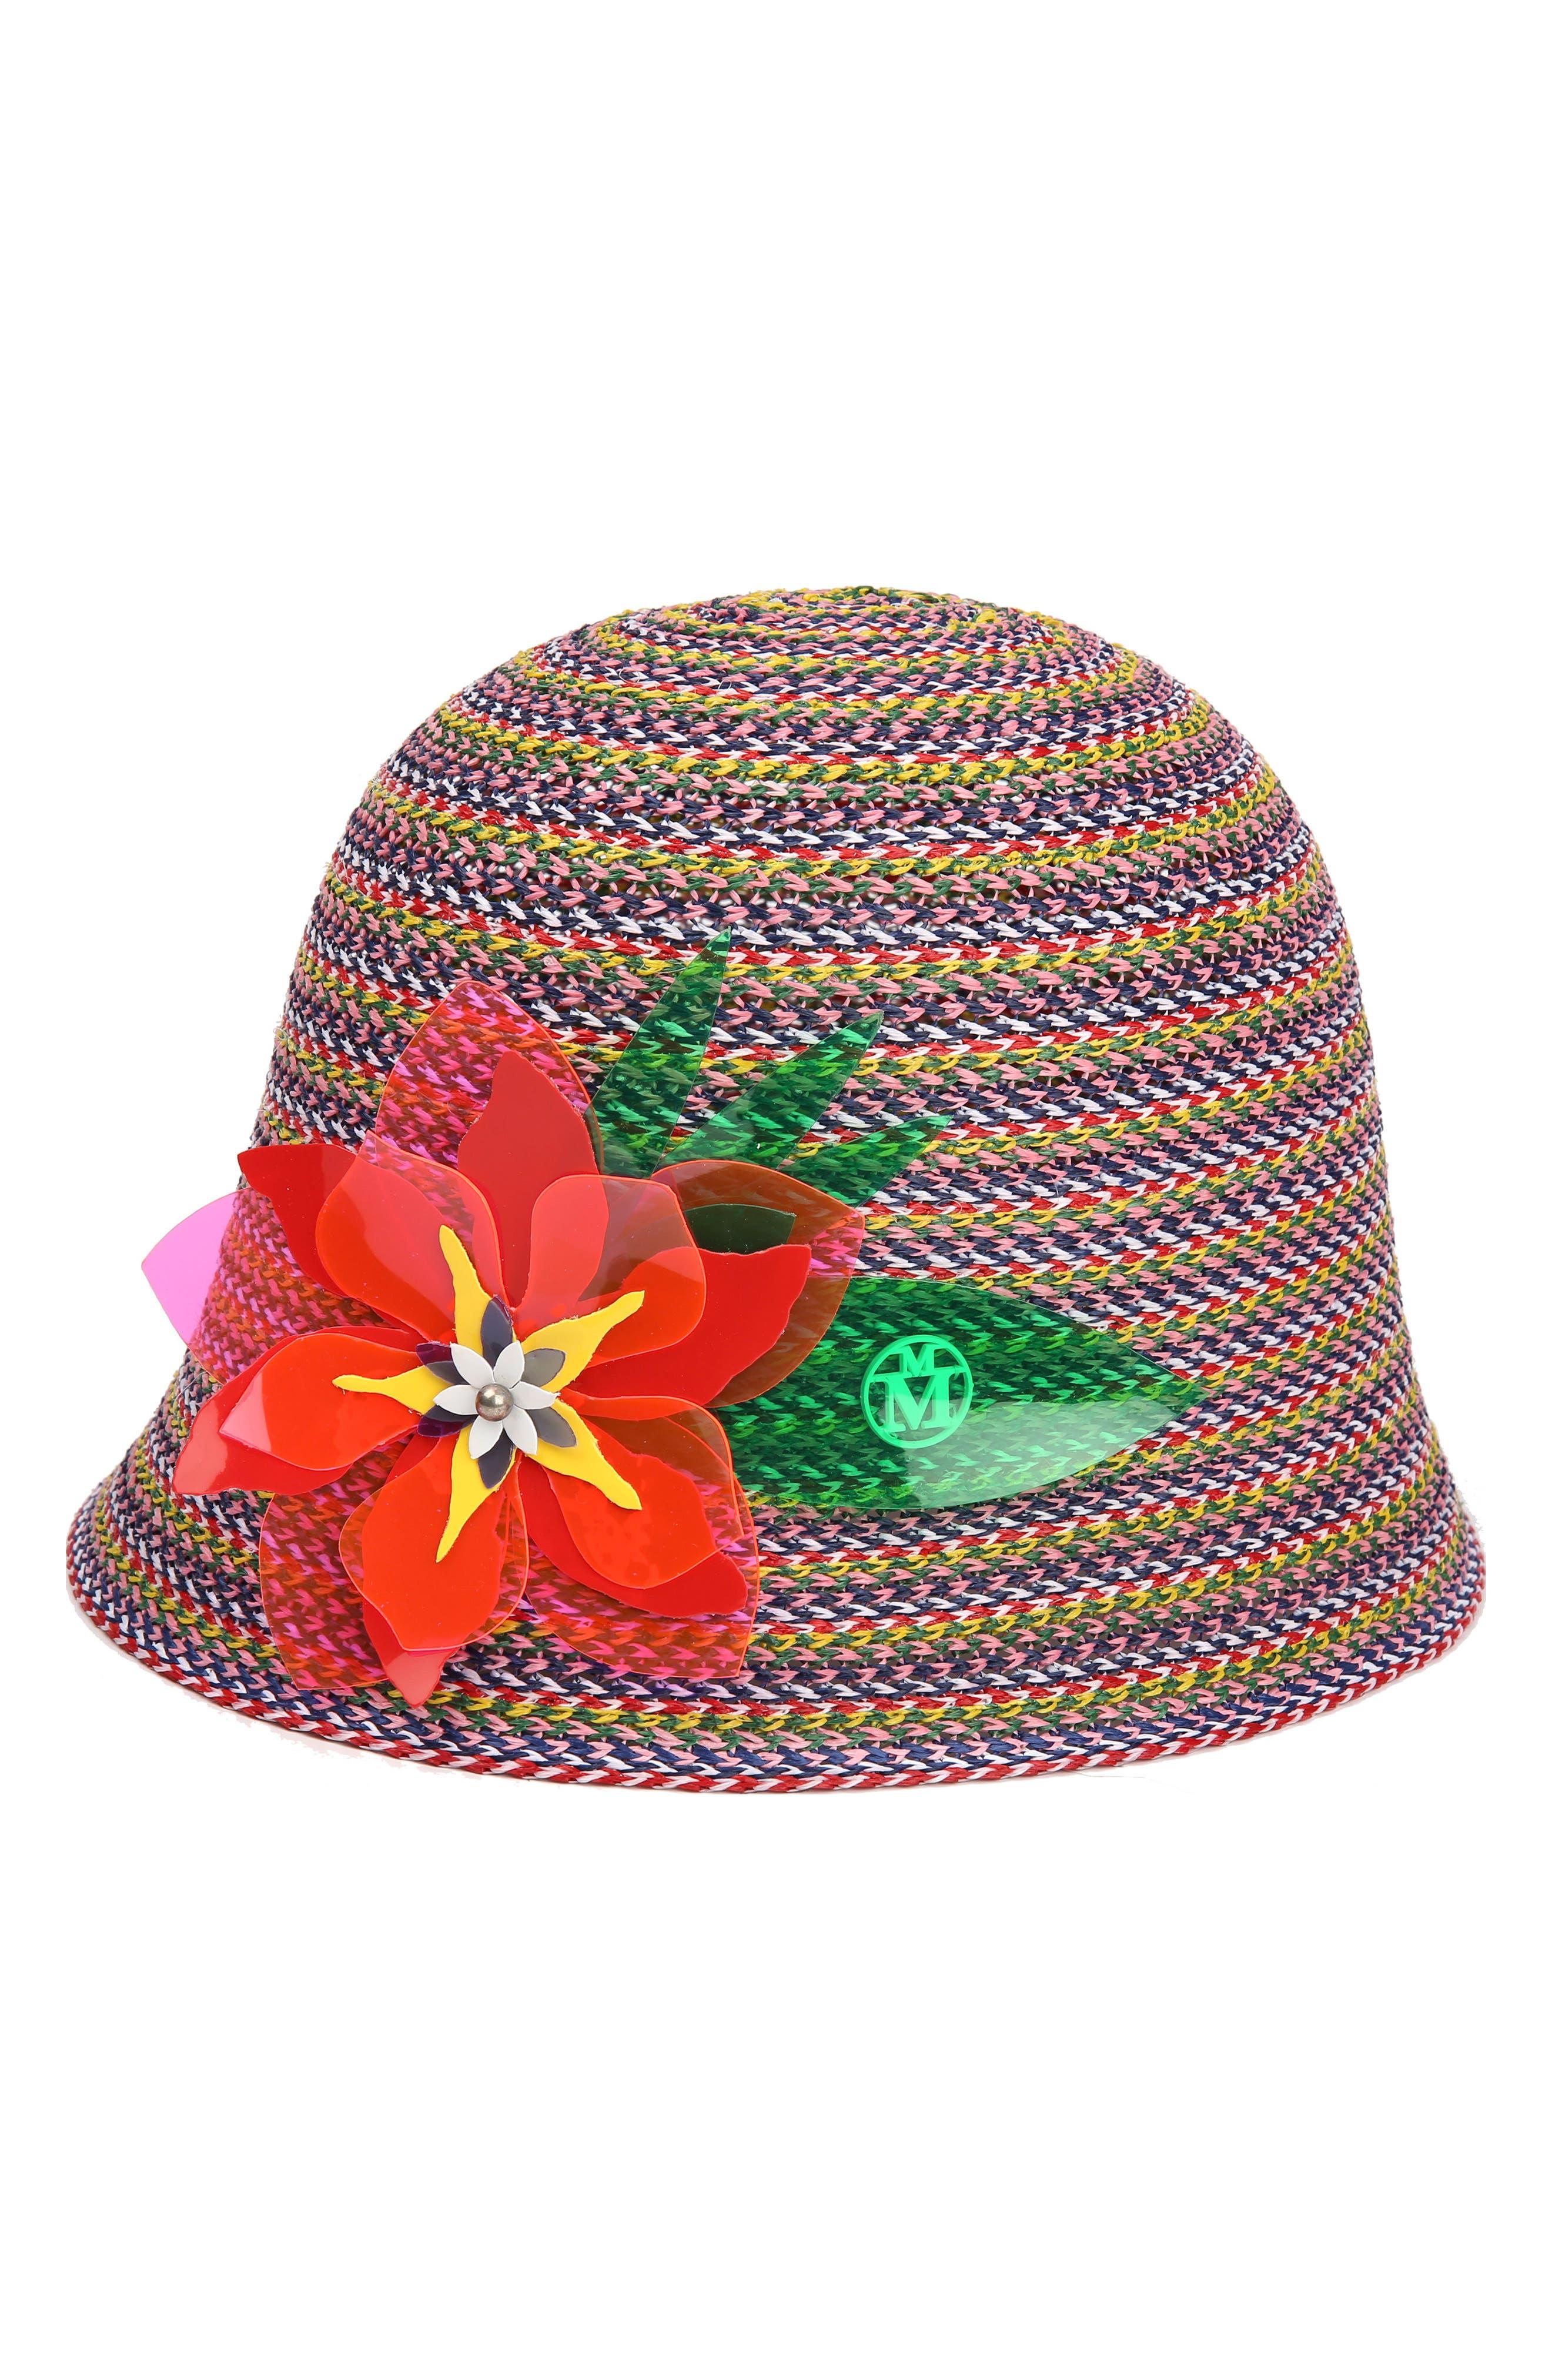 Jin Multicolor Straw Hat,                         Main,                         color, 600